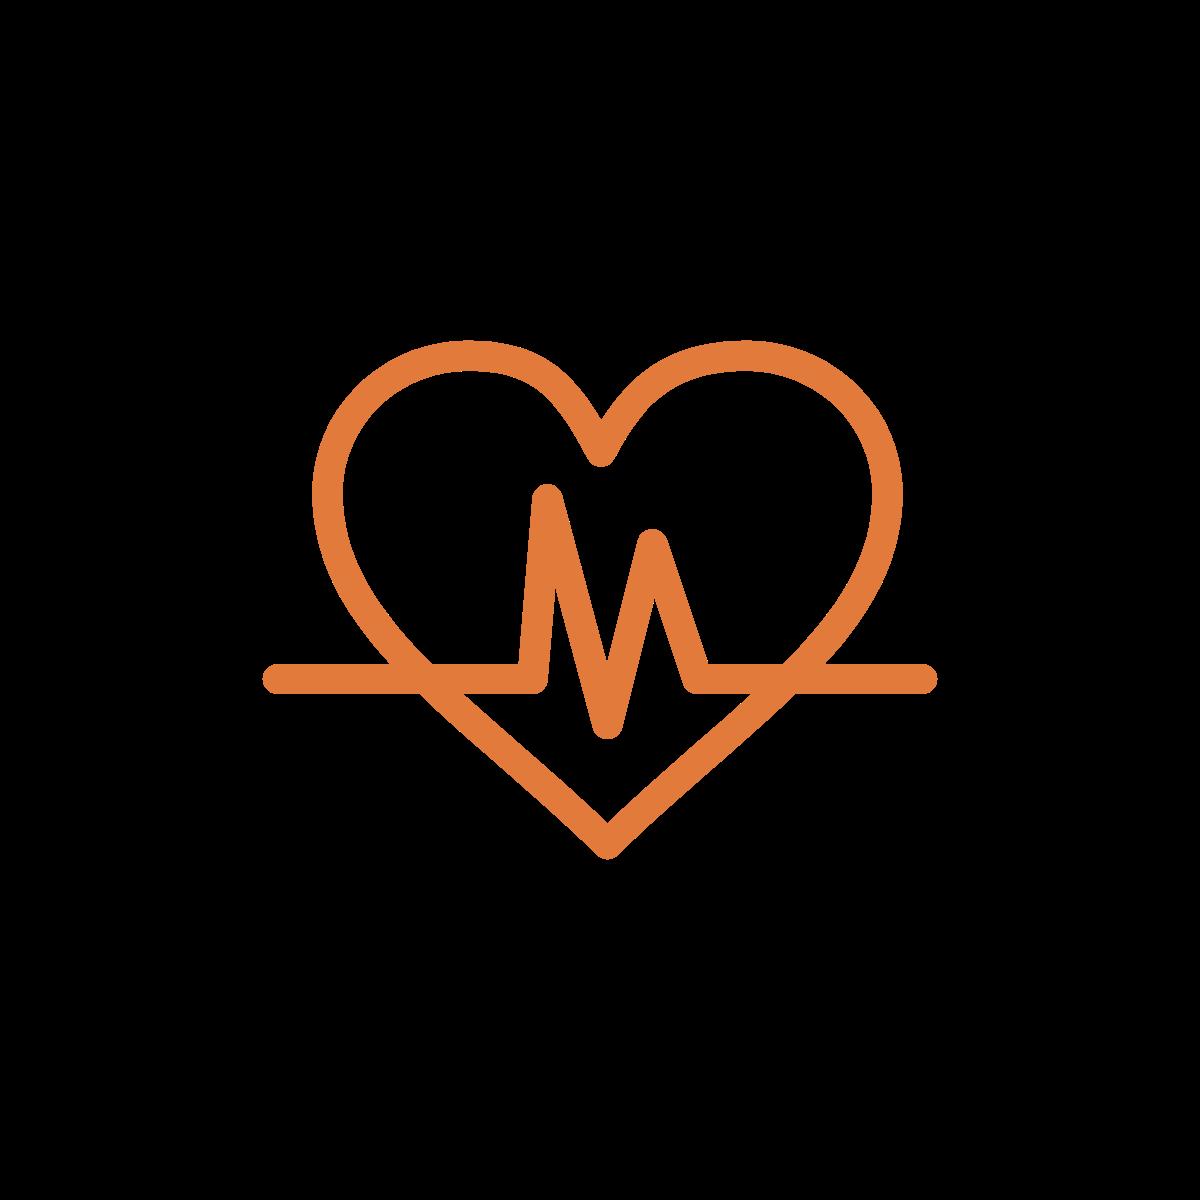 Heart & Cancer